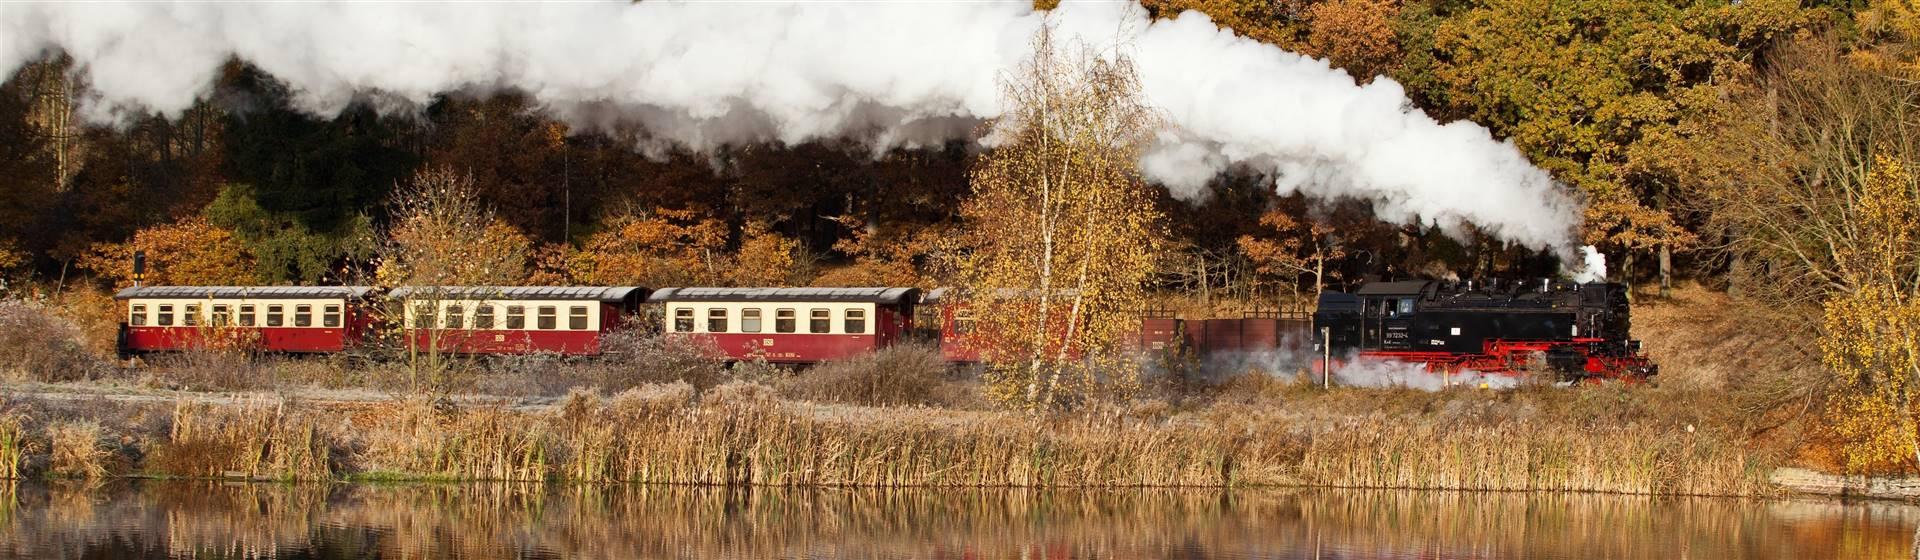 "<img src=""selketalbahnautumnadobestock_47666444.jpeg"" alt=""European Autumn""/>"